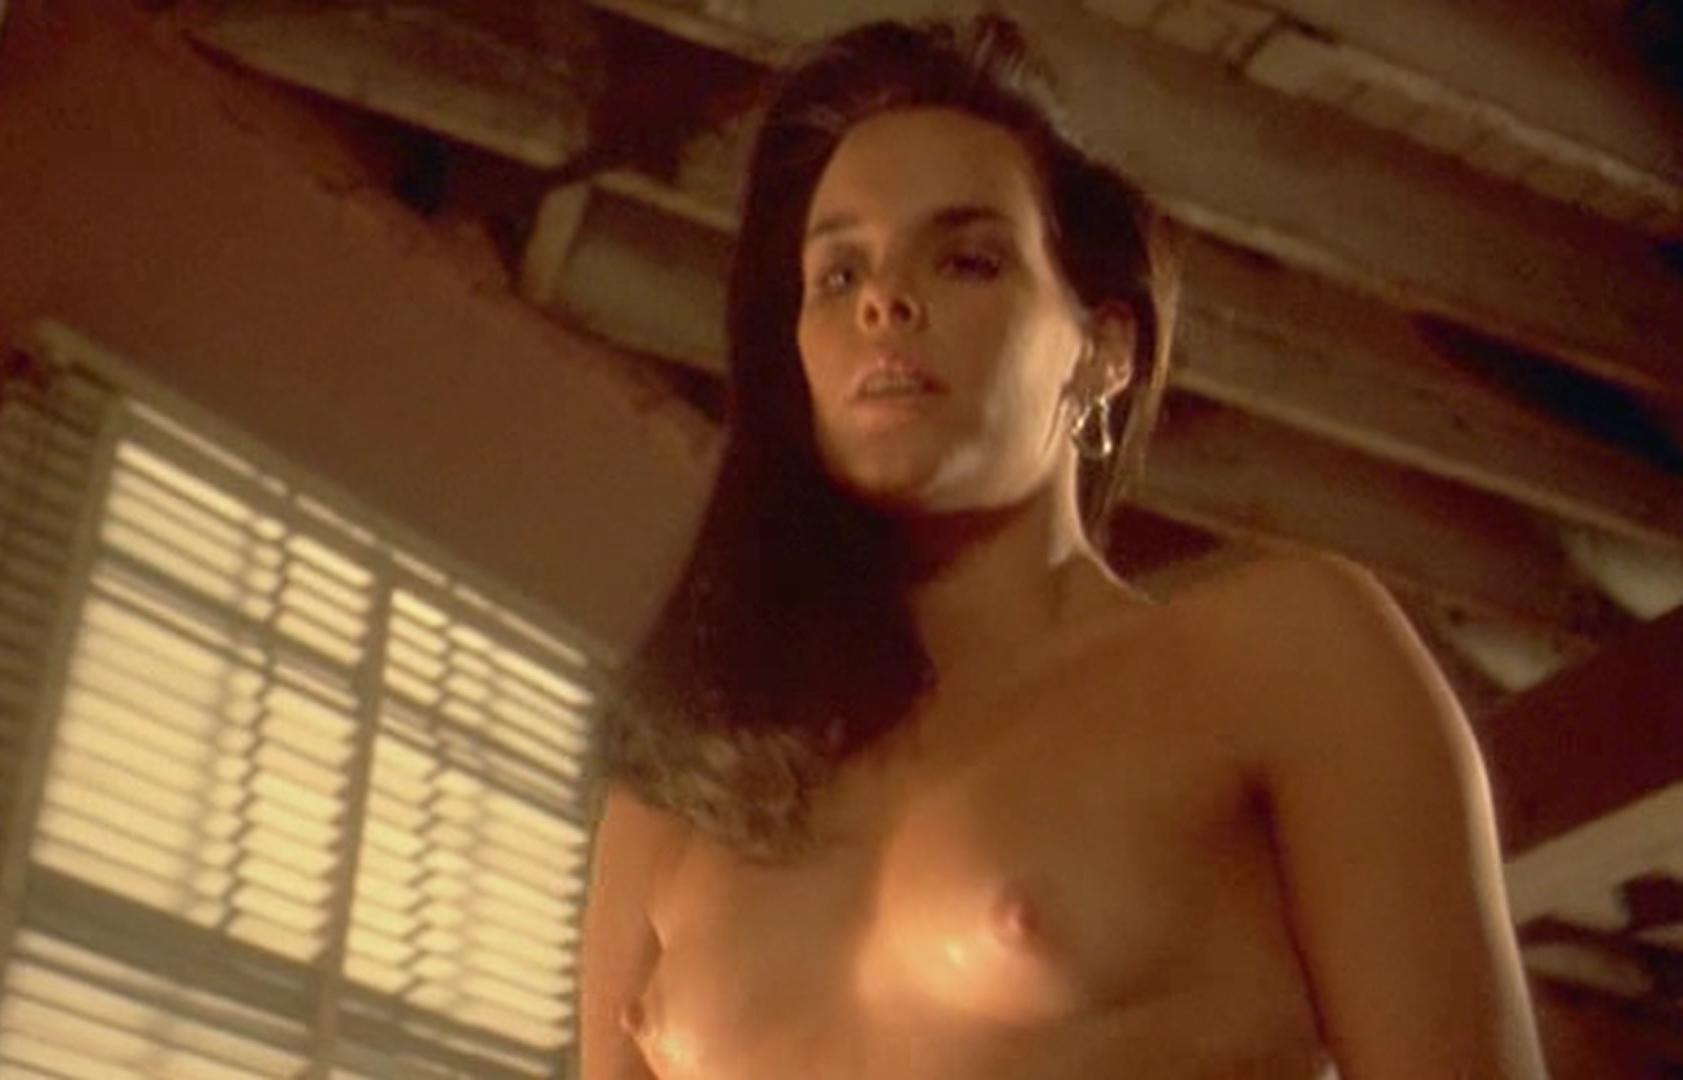 Alexandra Video Porno alexandra paul nude sex scene in sunset grill movie - free video